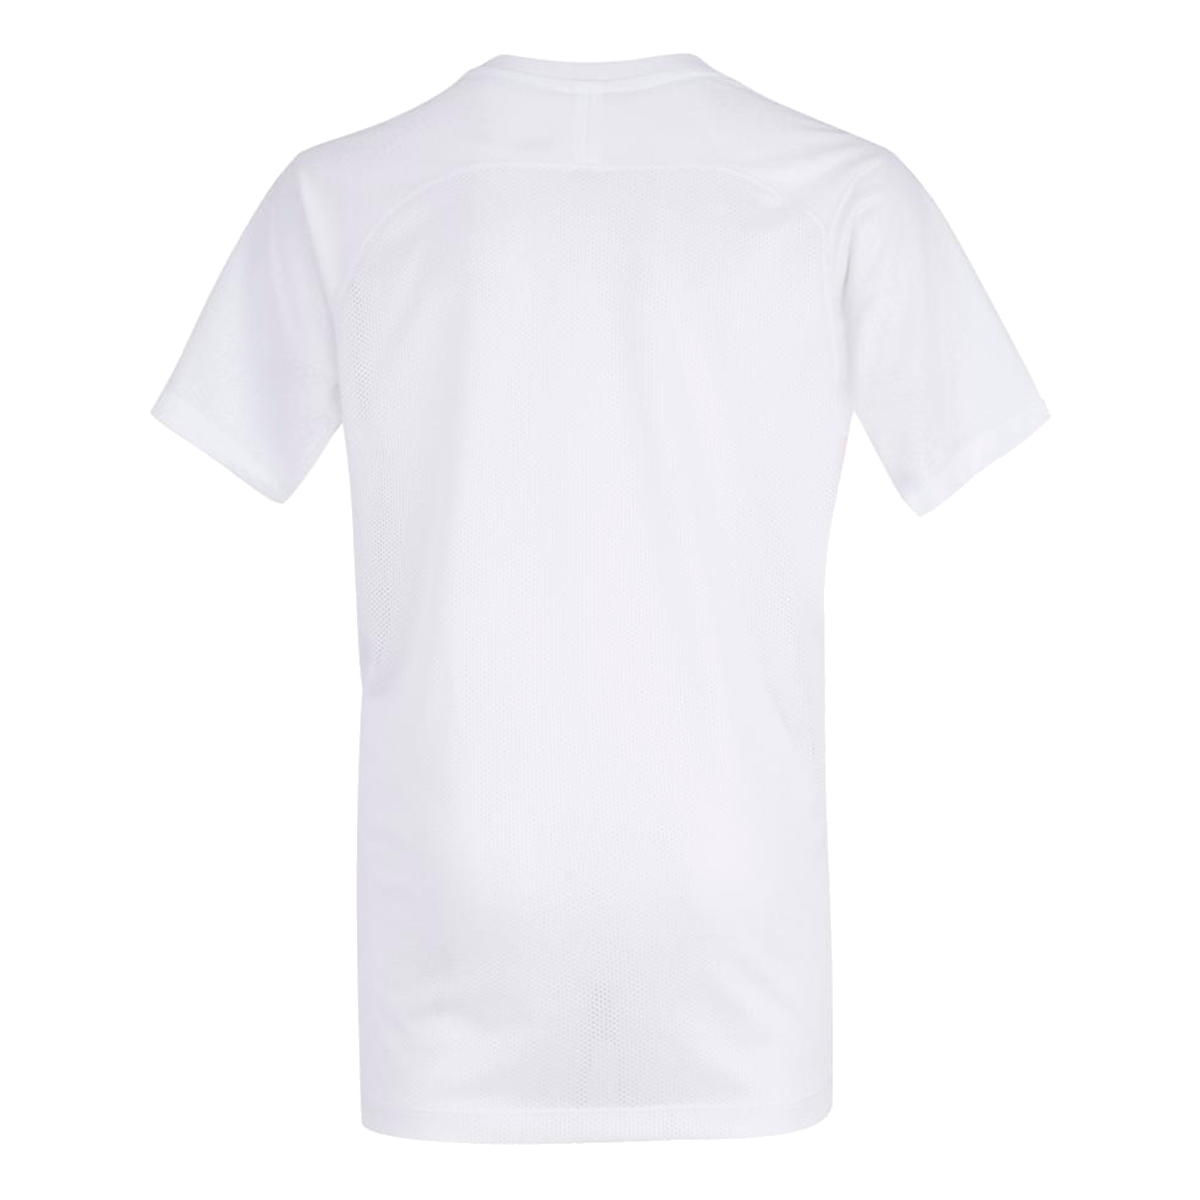 Camiseta Nike Dri-Fit Mercurial CR7 Infantil Branco